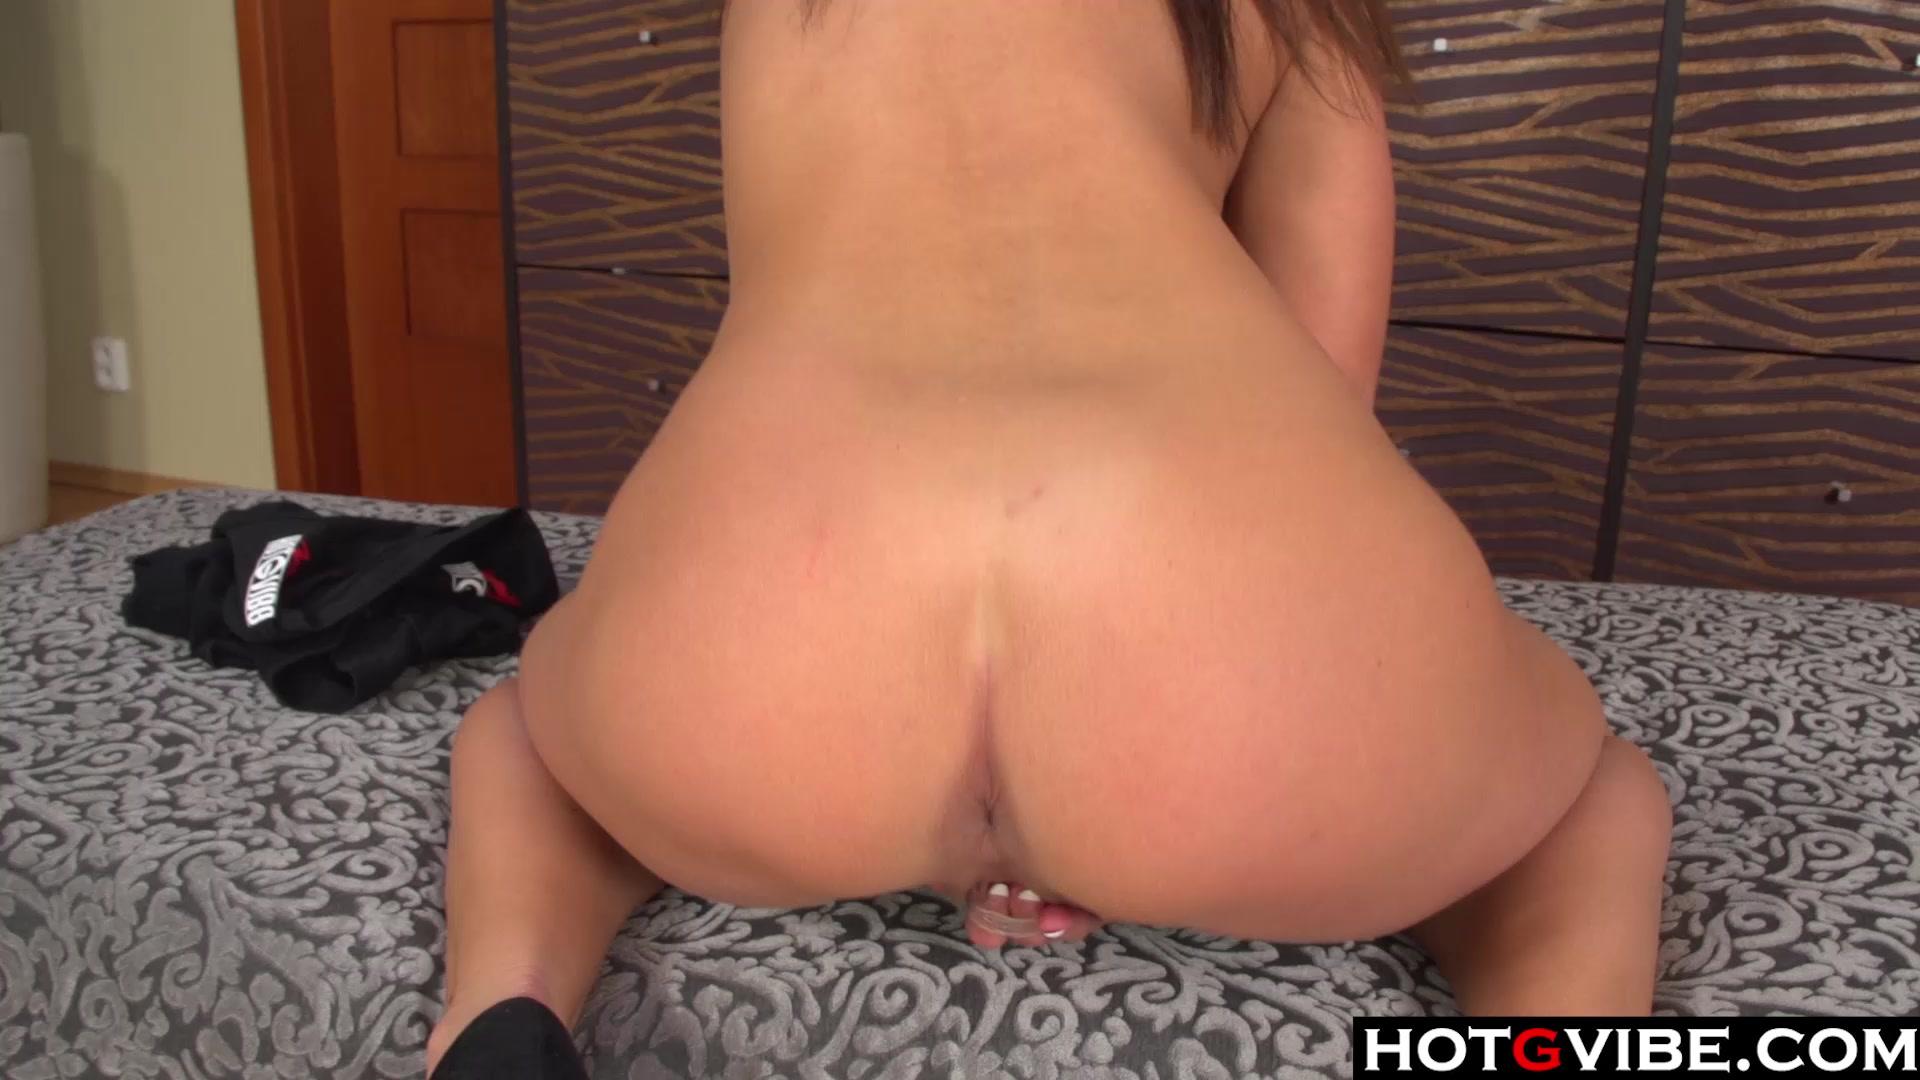 Hot porno Boundless org dating